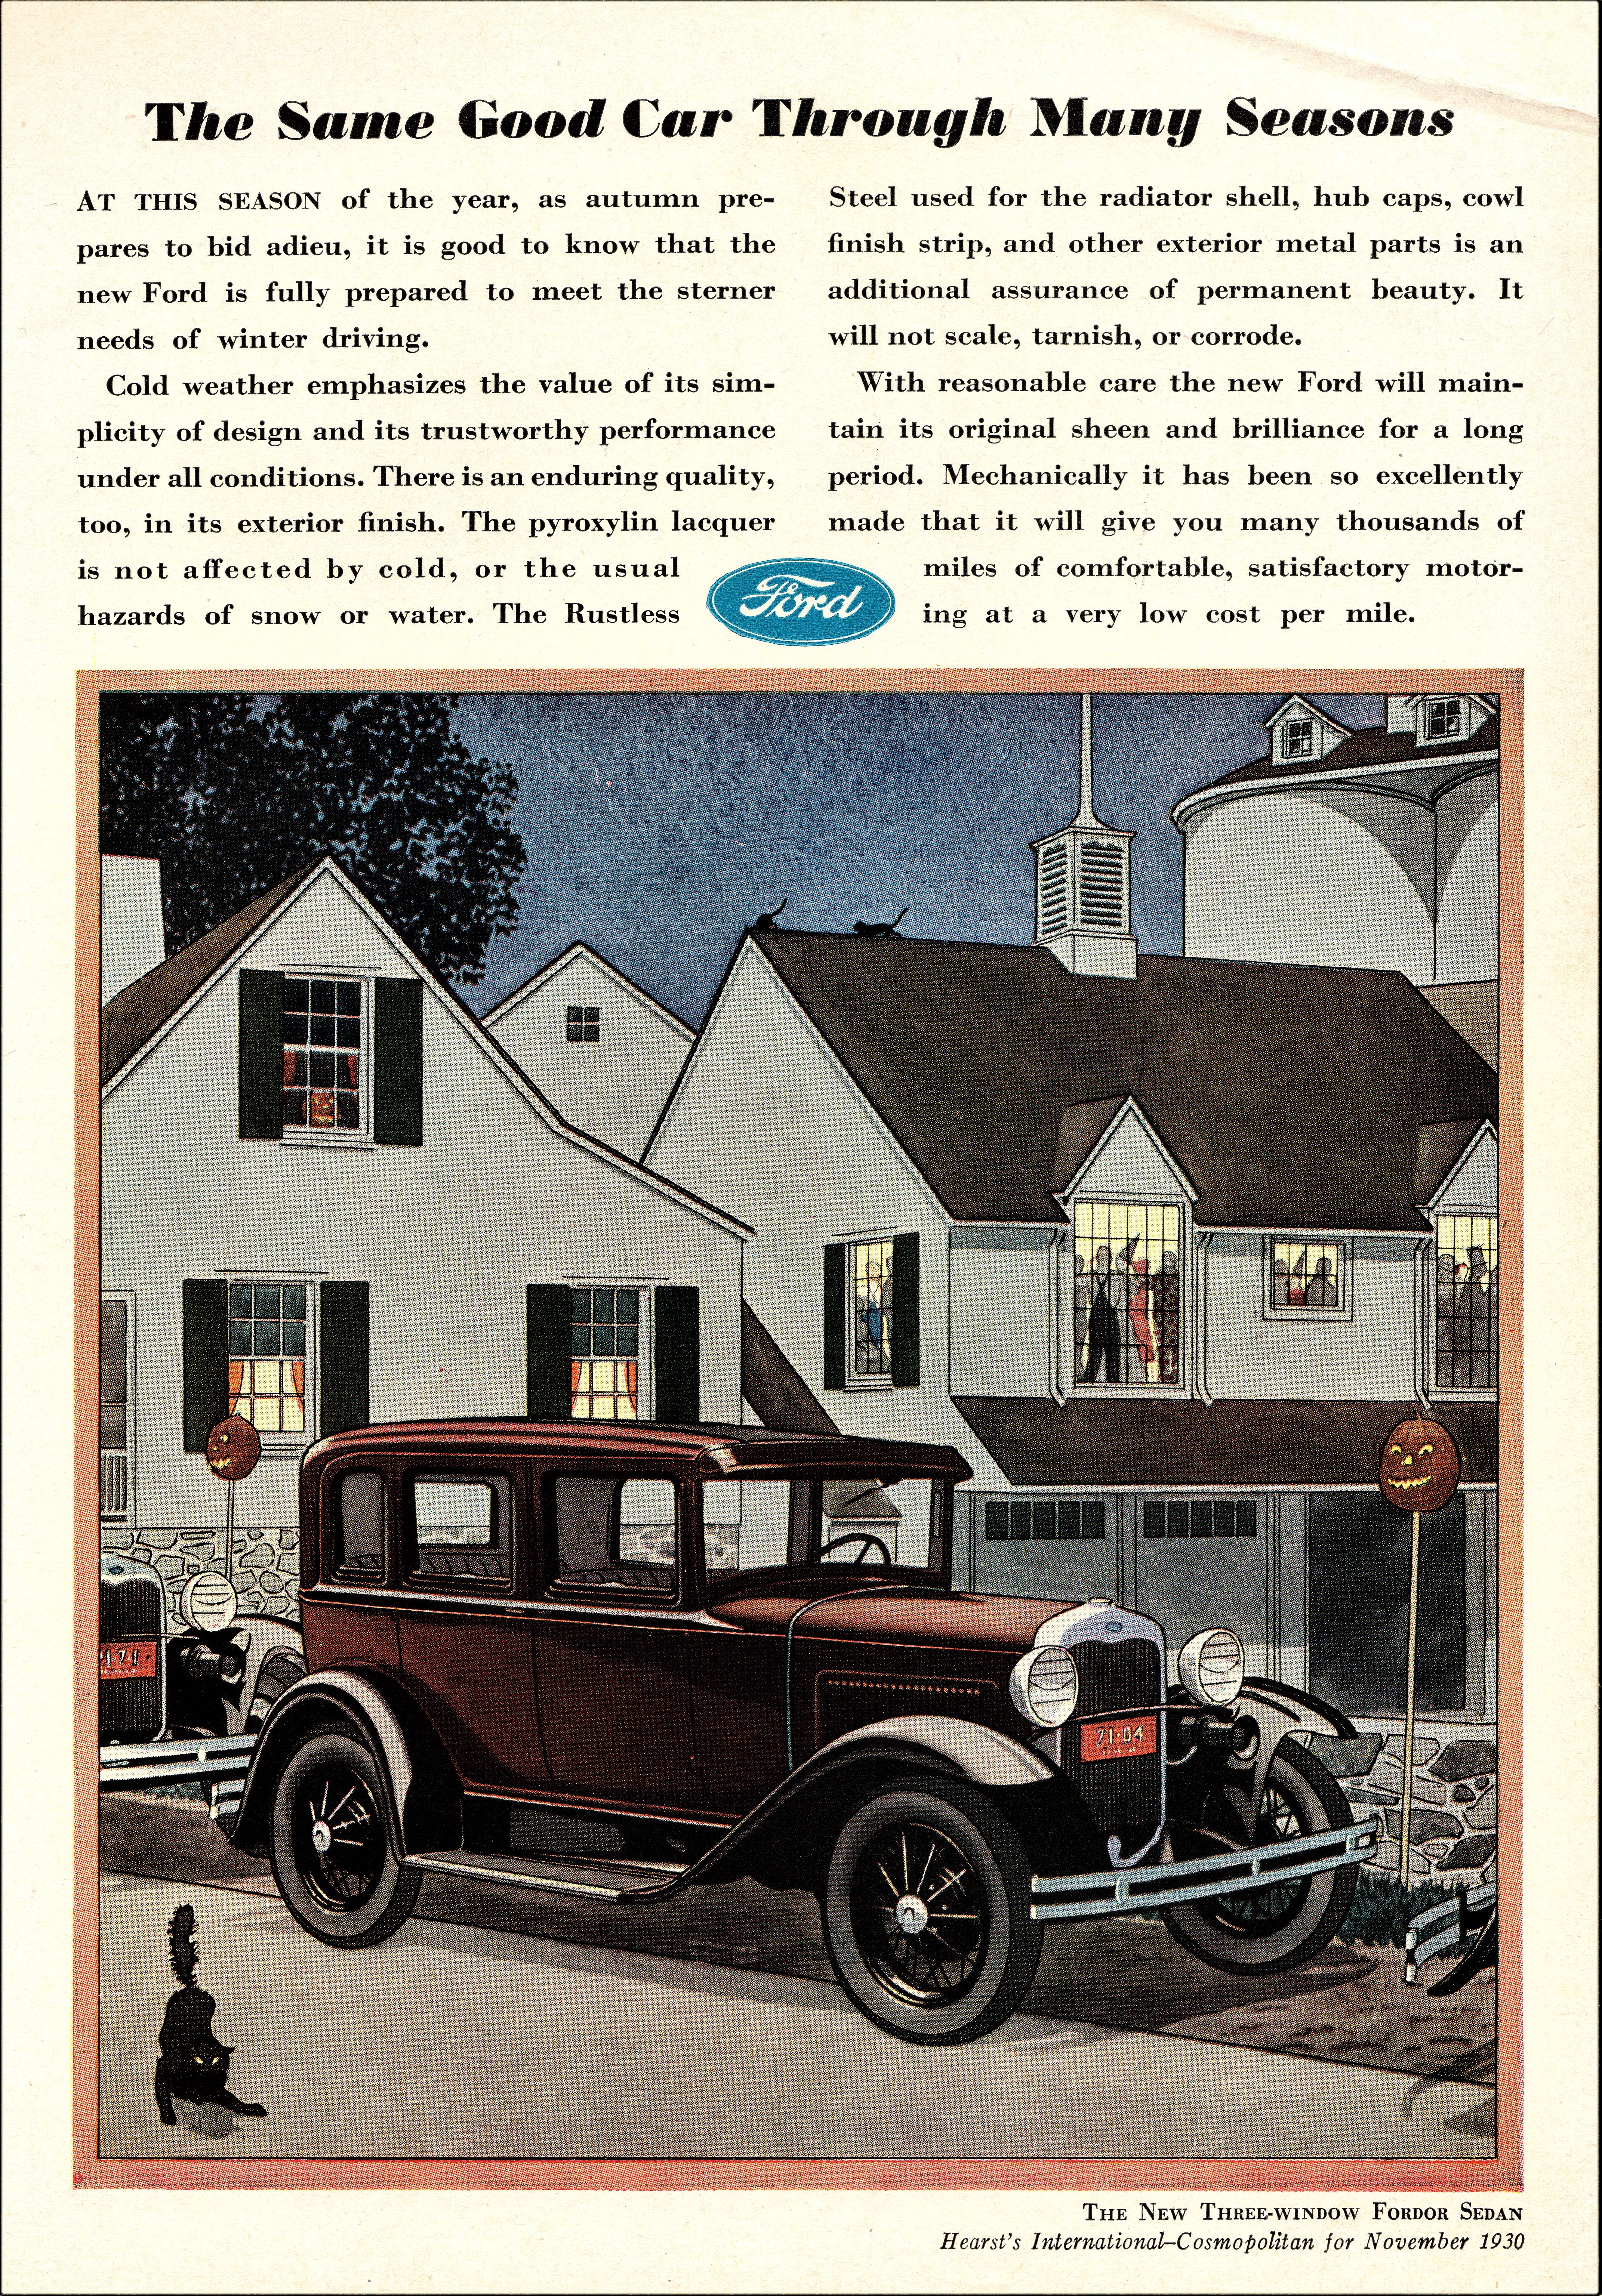 1930 Ford Model A Three-Window Fordor Sedan - Hearst's International-Cosmopolitan - November 1930